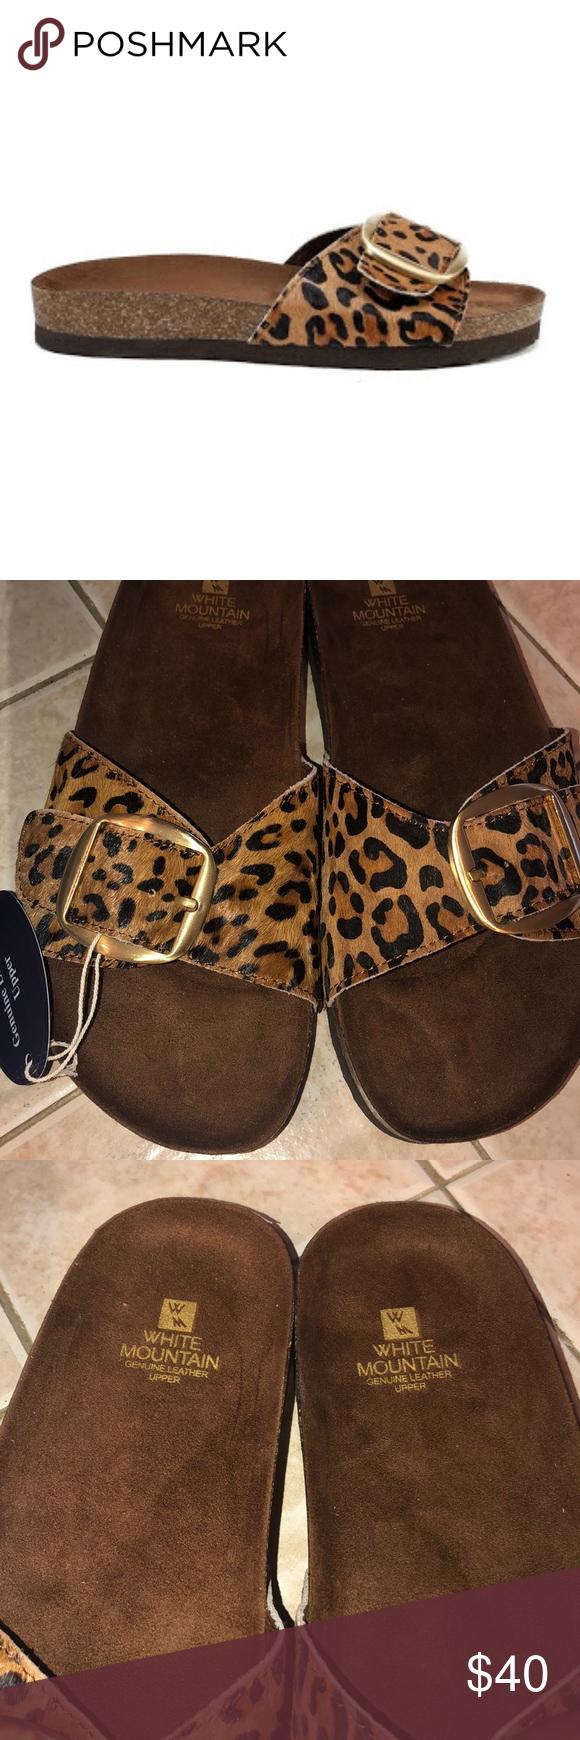 white mountain leopard sandals